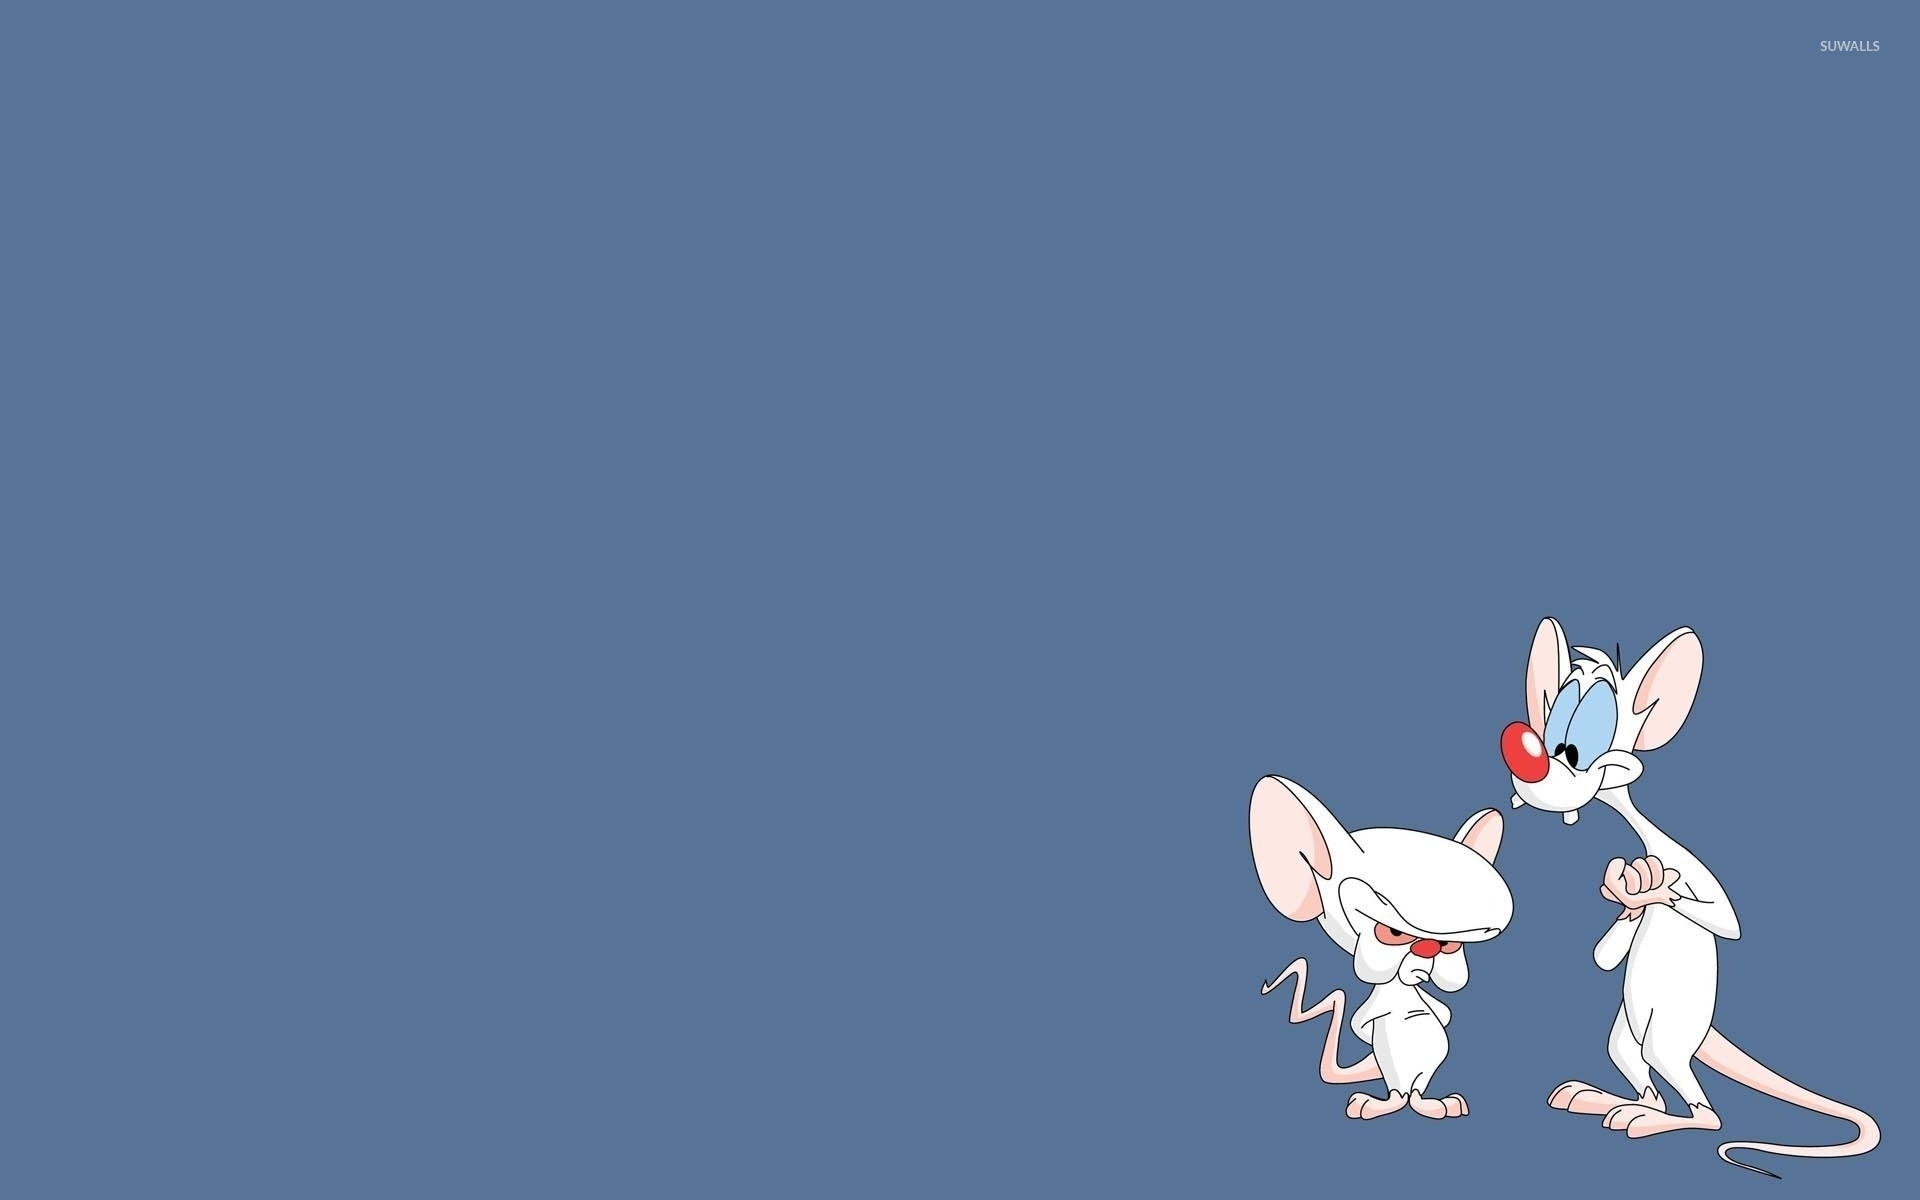 Minion Girl Wallpaper Pinky And Brain Pinky And The Brain Wallpaper Cartoon